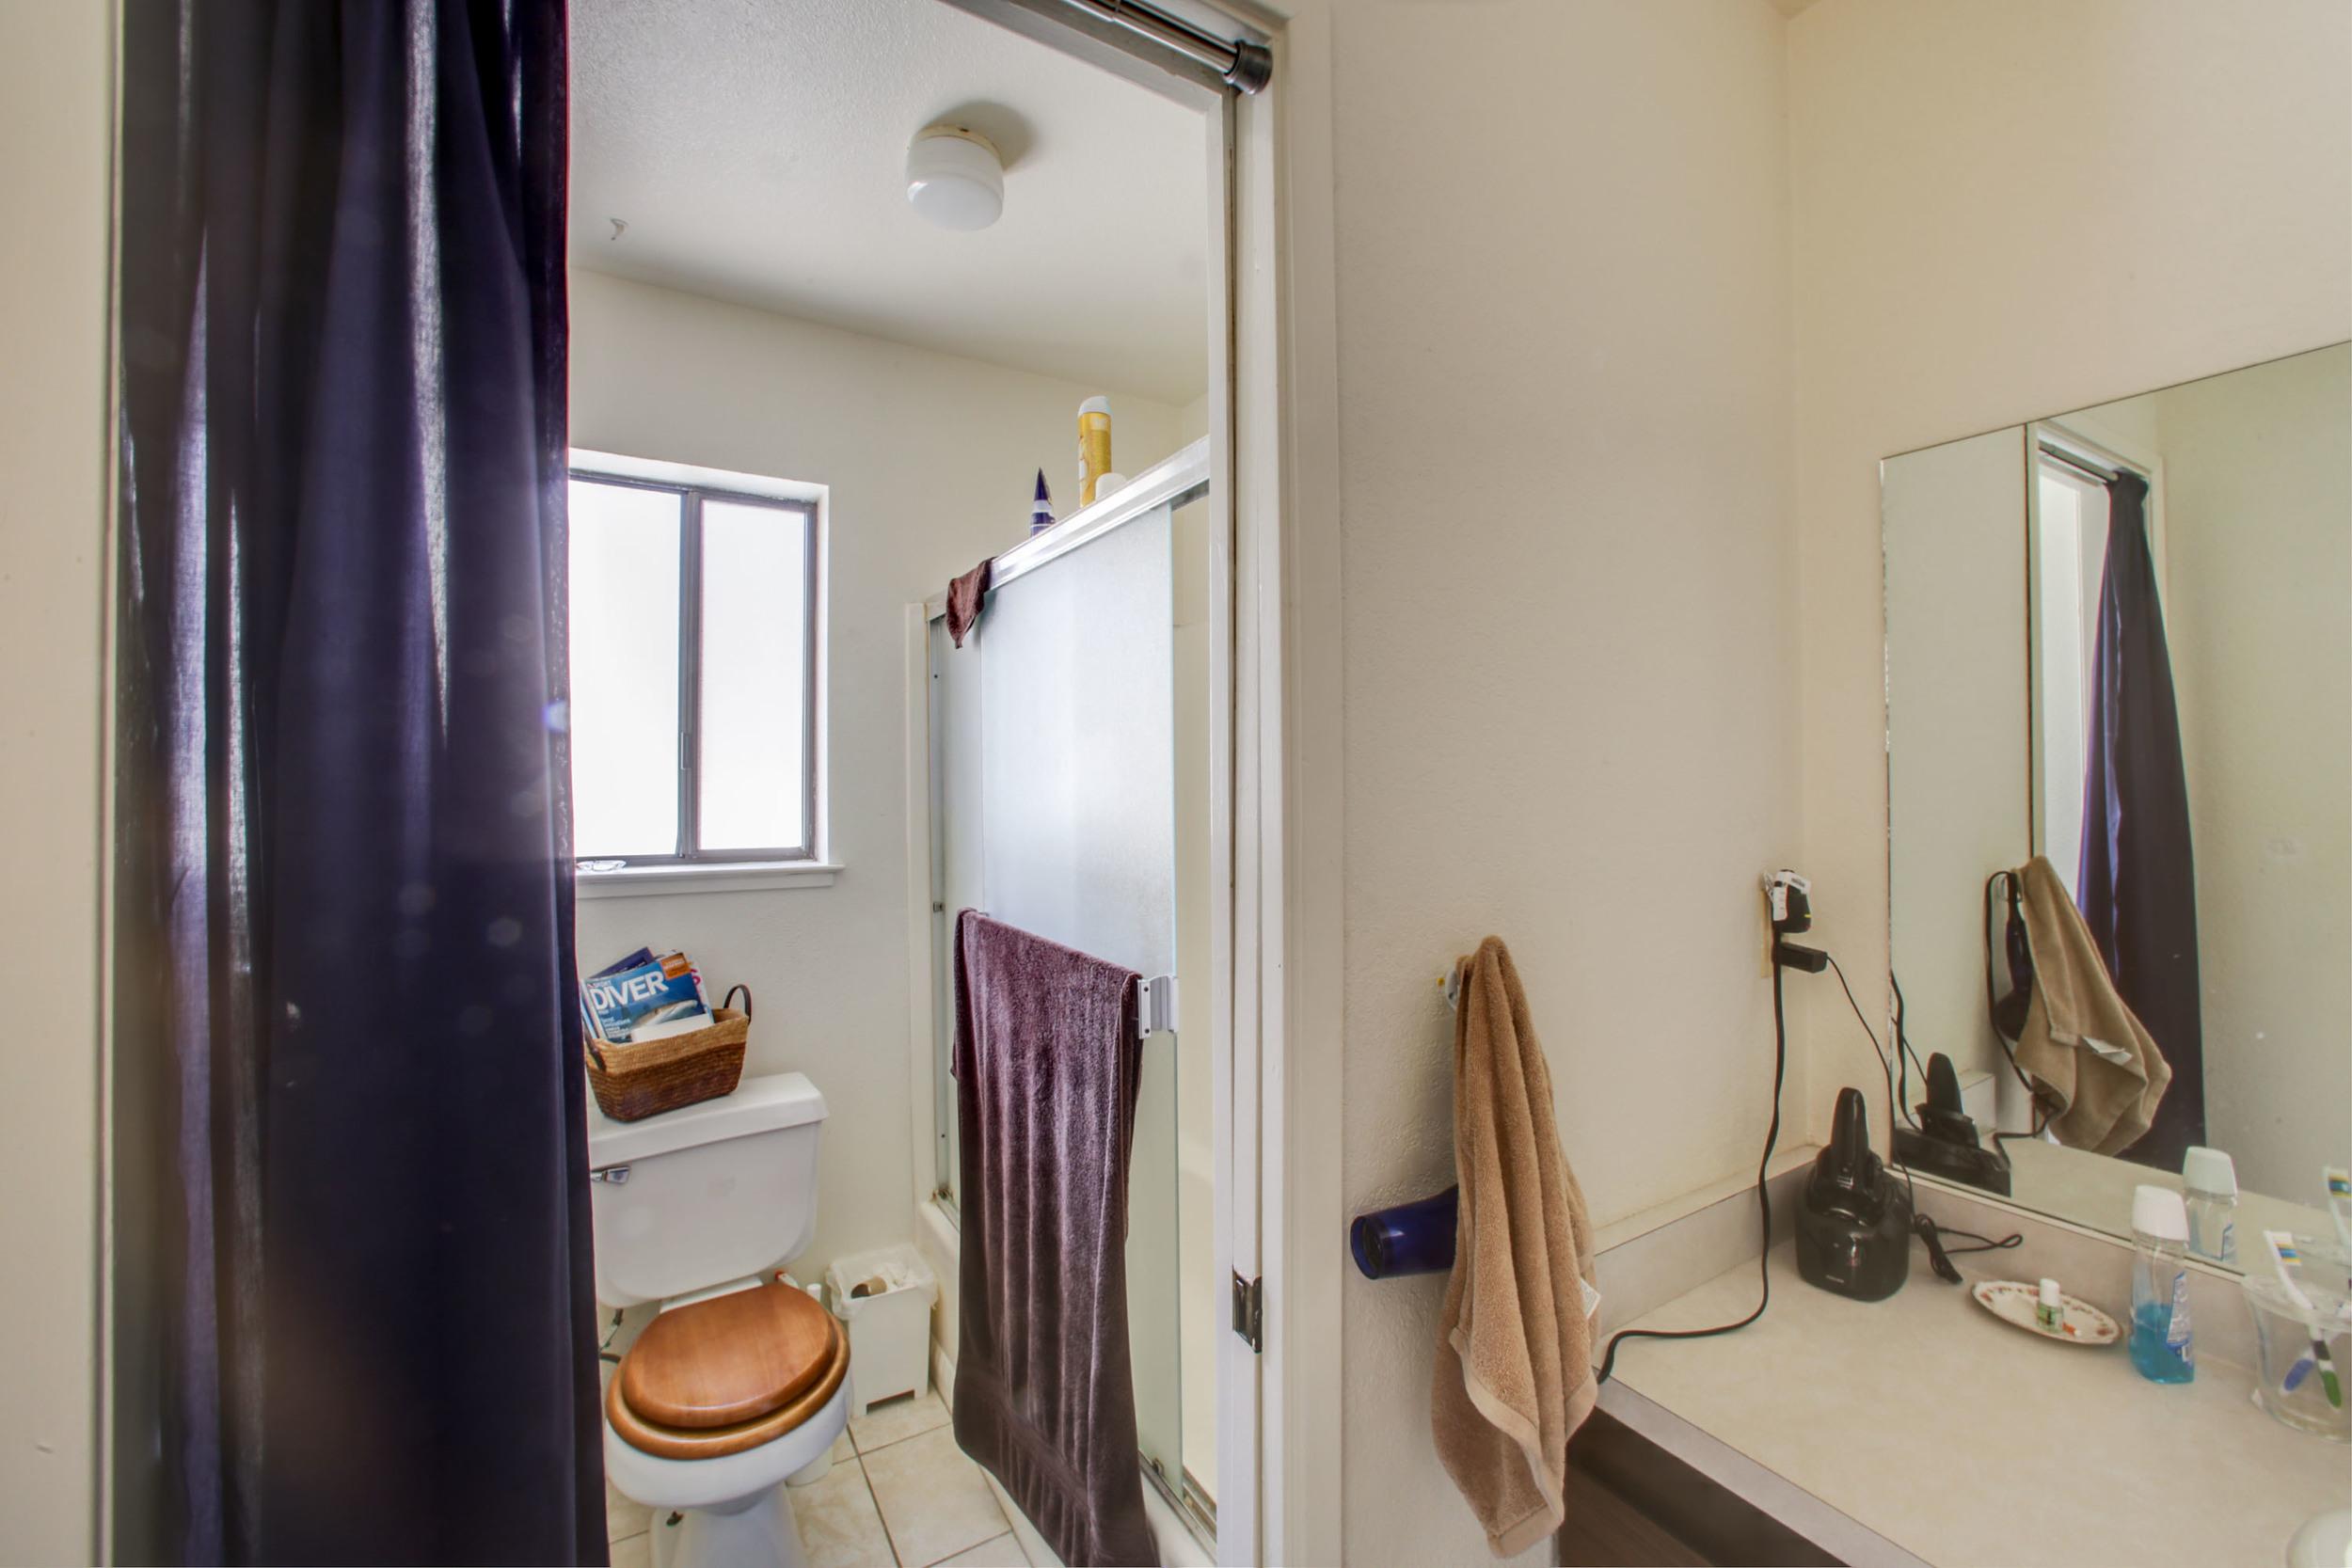 Unit C bathroom-18.jpg